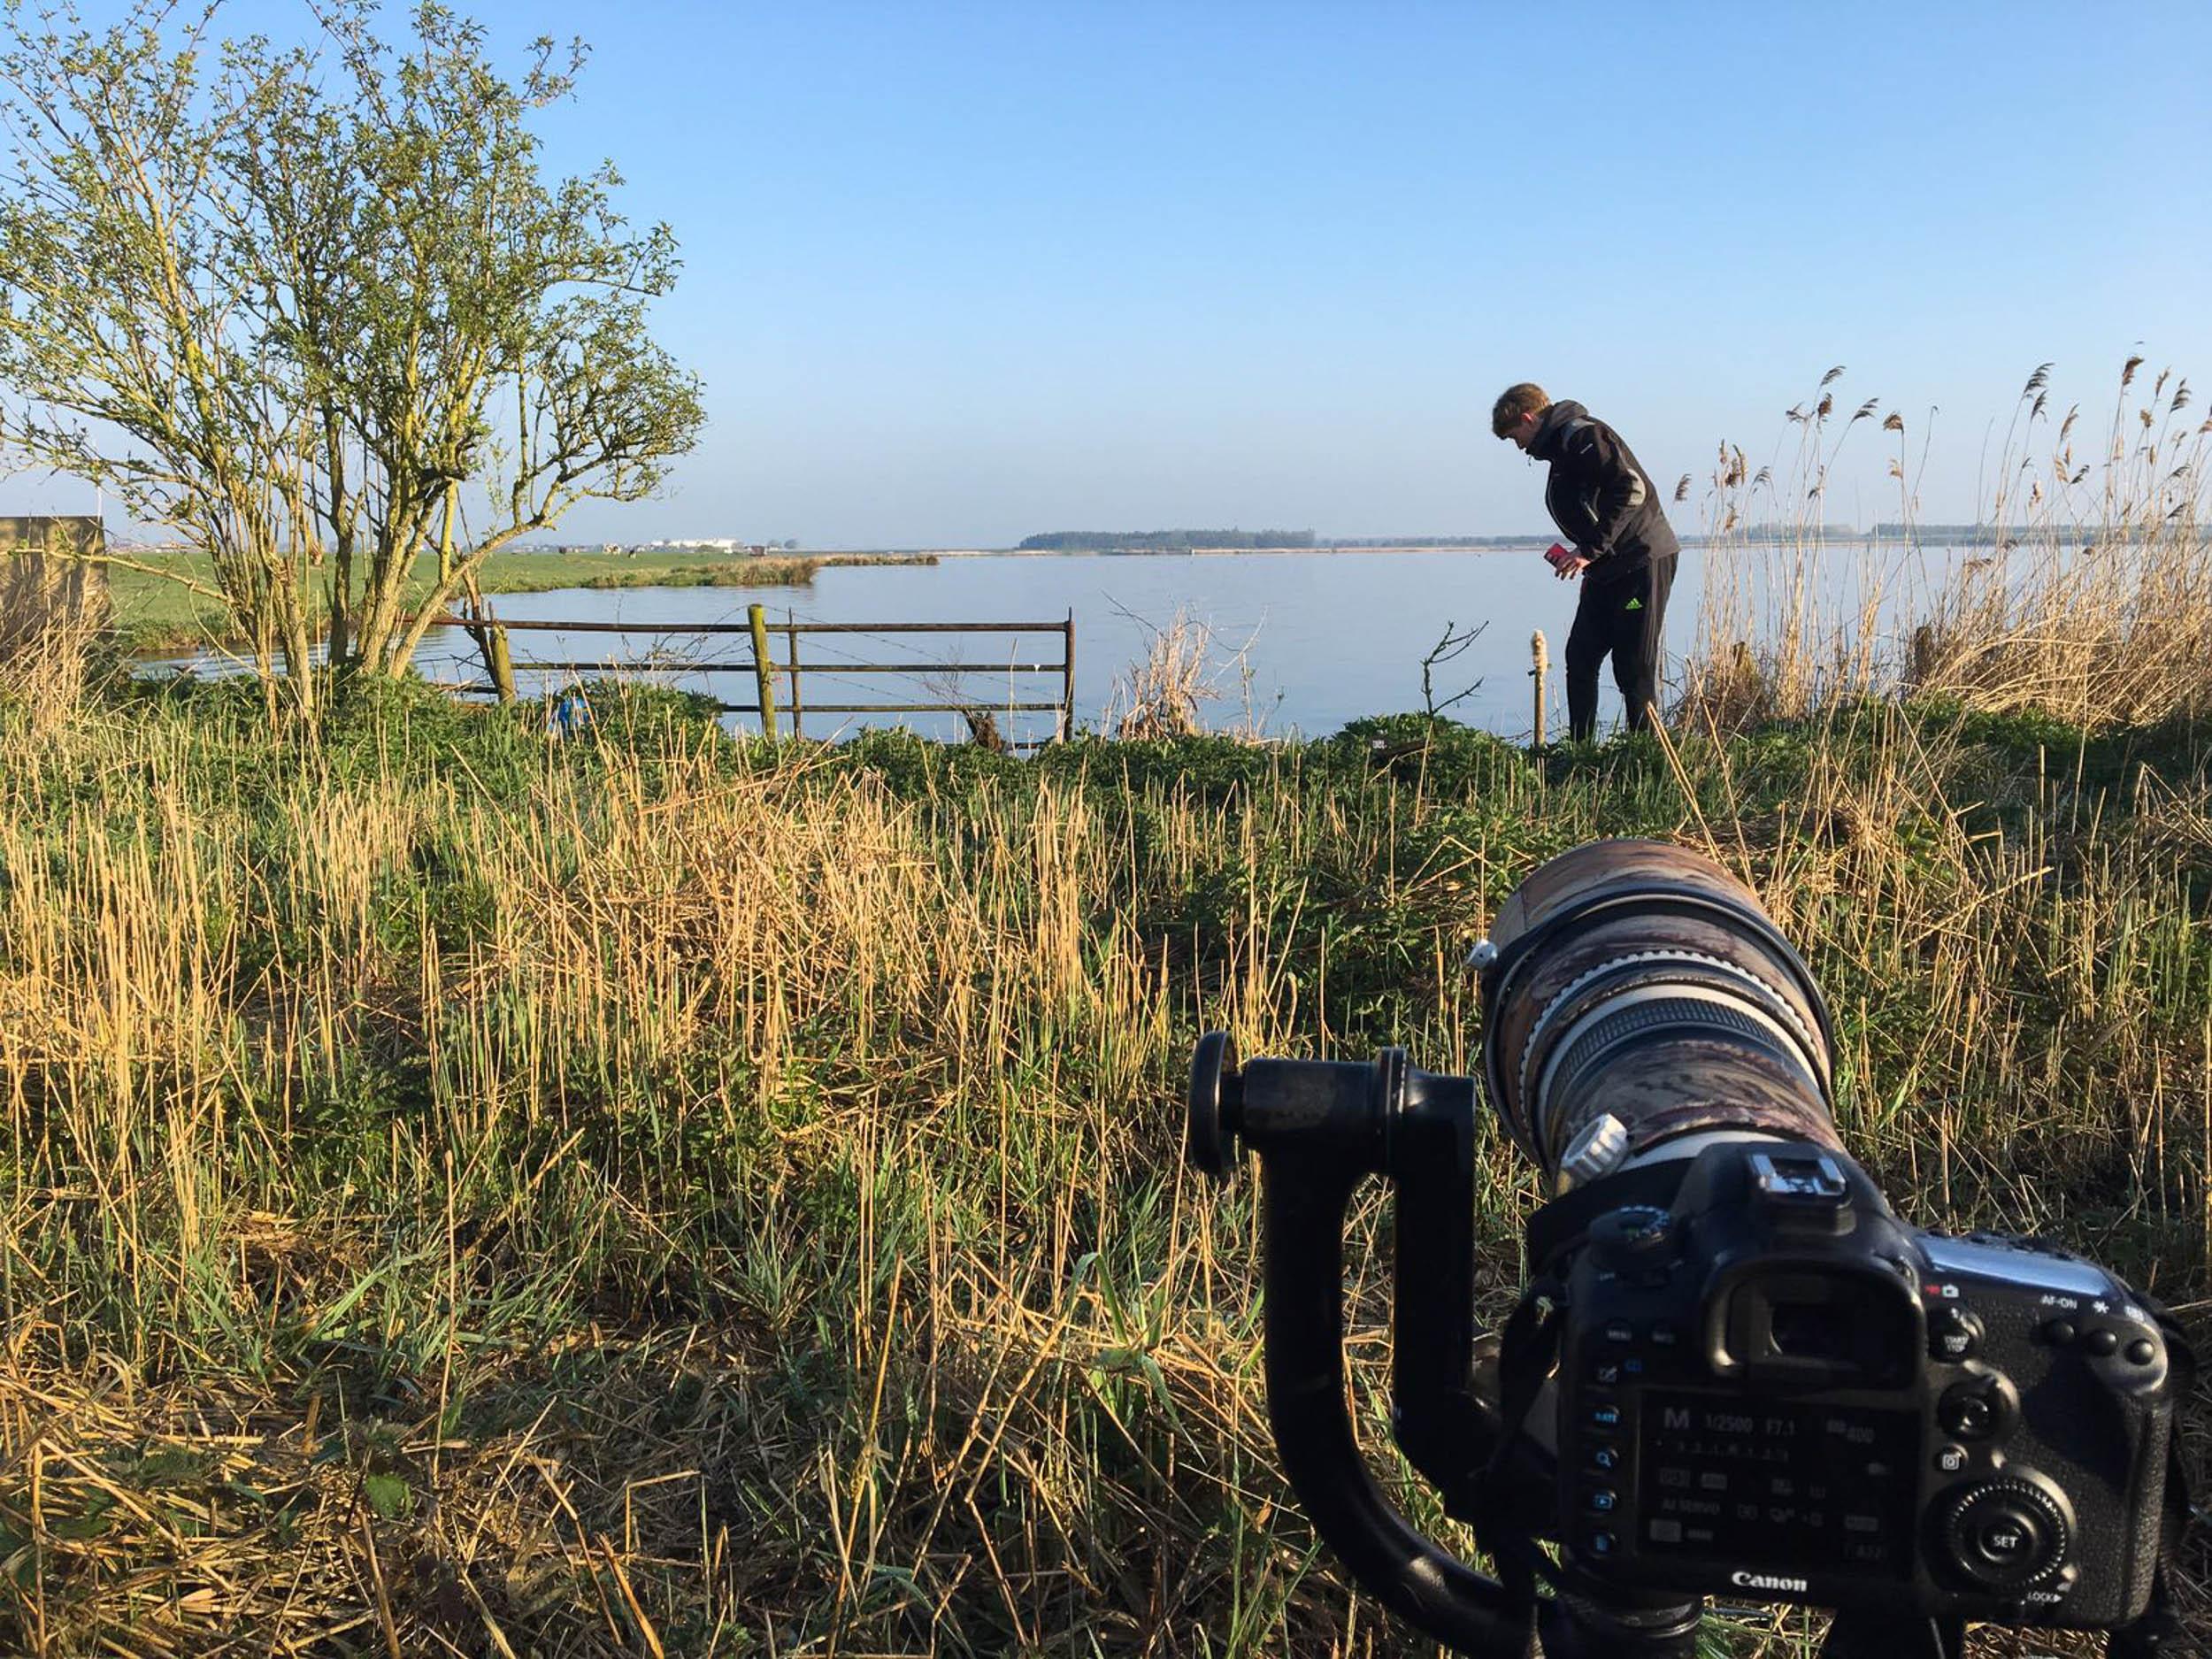 Preparing to photograph bluethroats